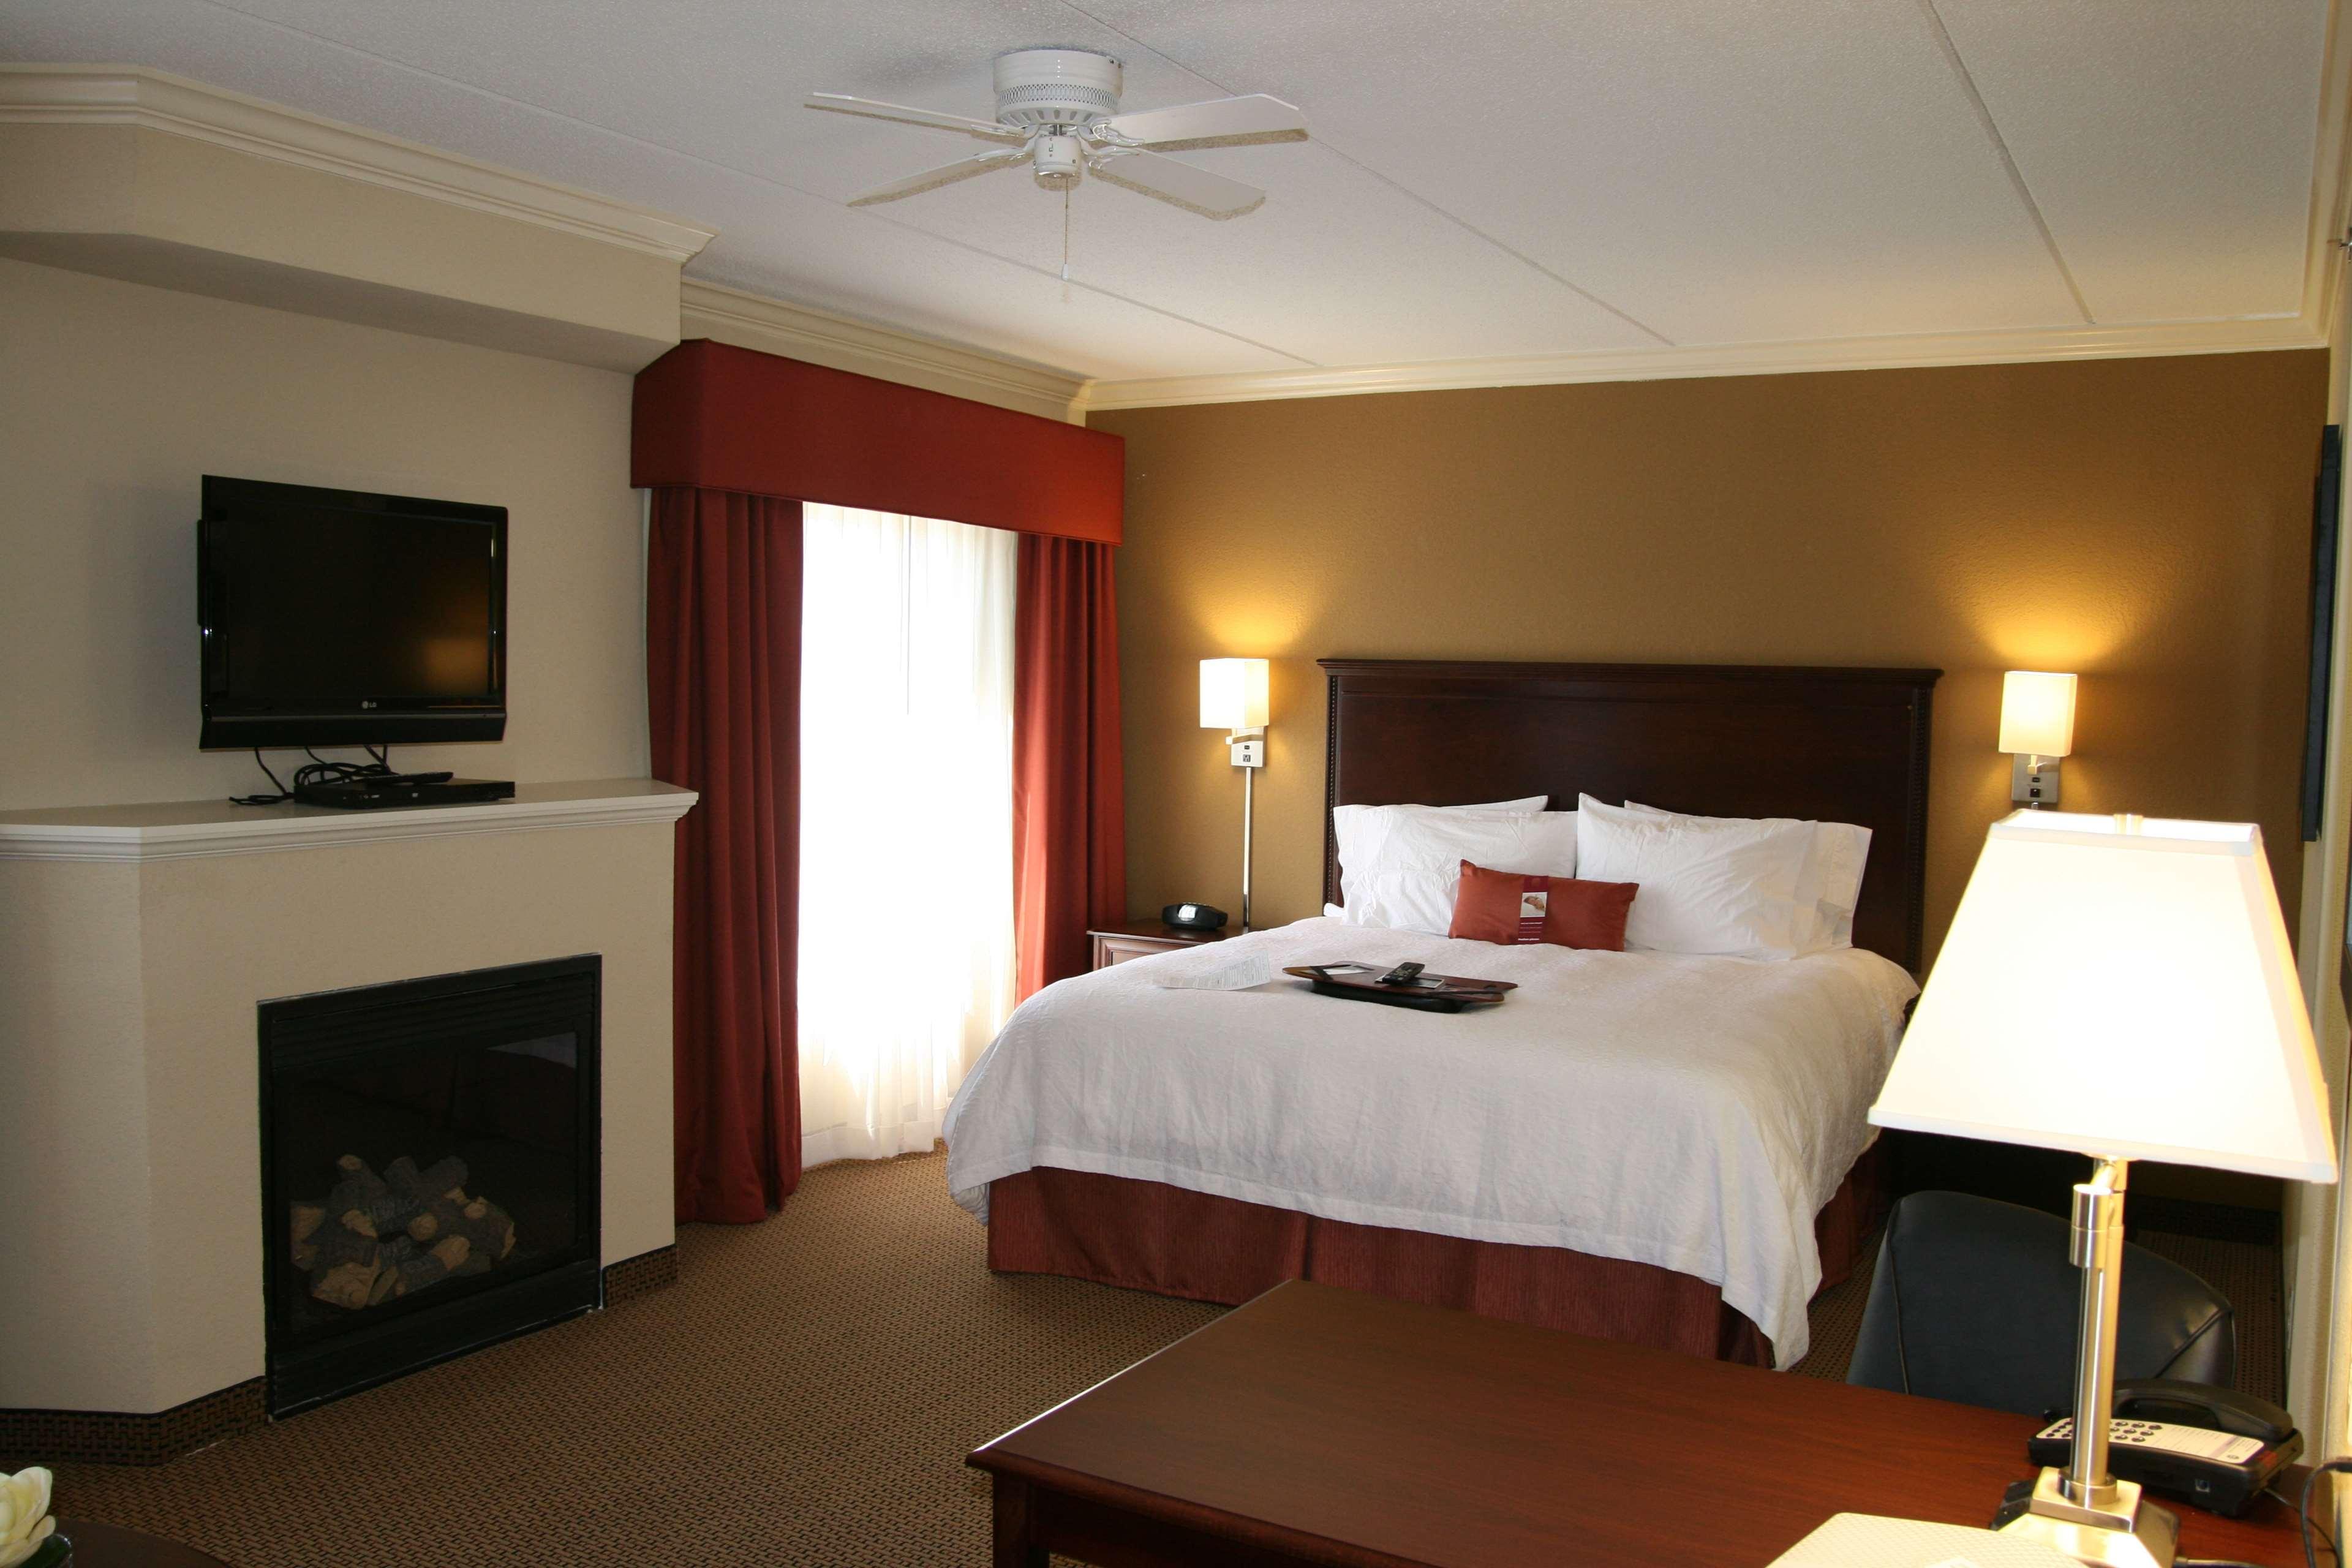 Hampton Inn & Suites Lanett-West Point image 21